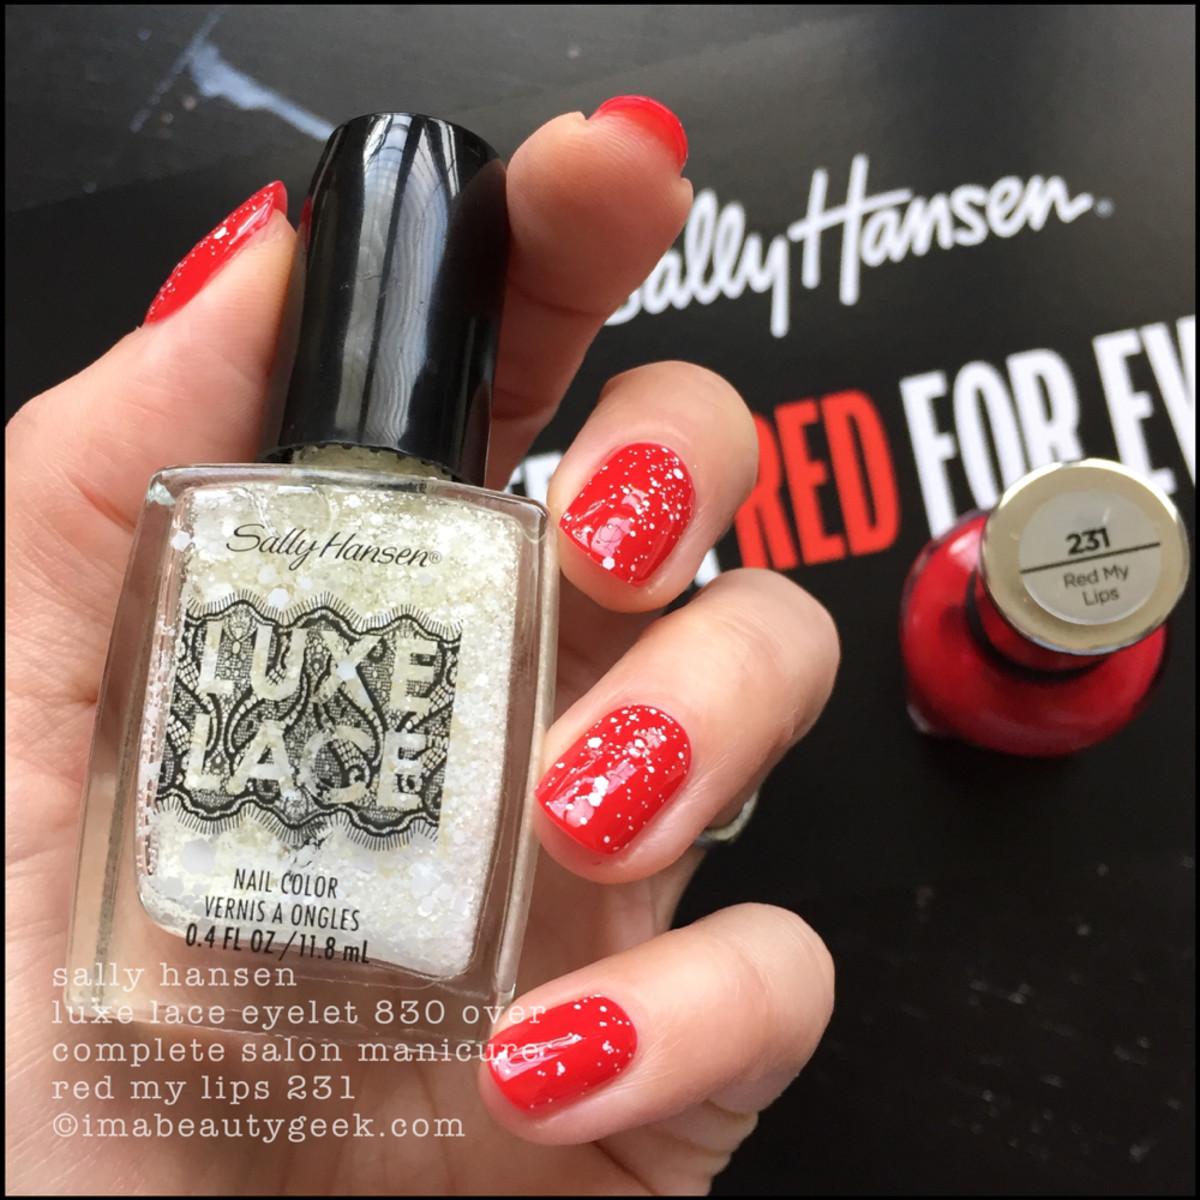 Sally Hansen Lace Eyelet over Warm Regards CSM 235 - Red/esign Collection 2018